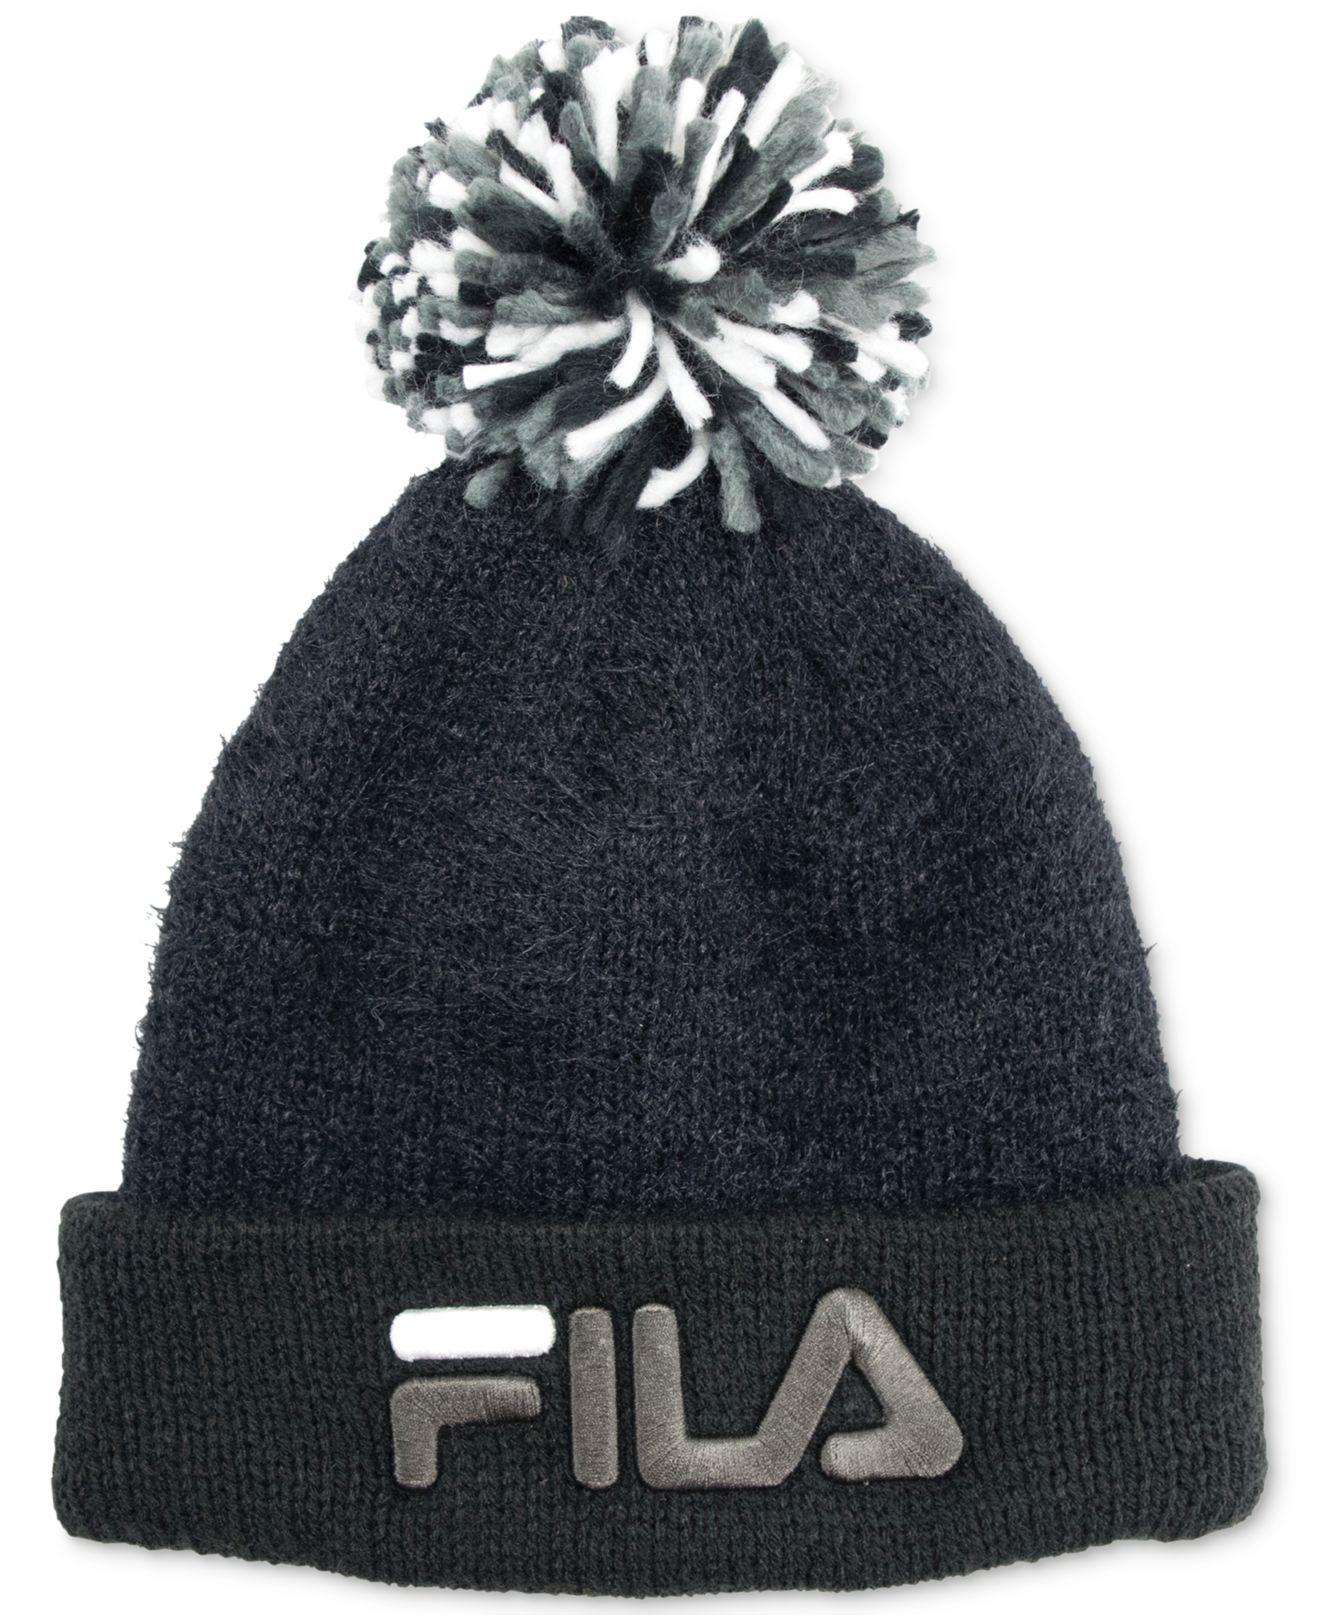 Lyst - Fila Knit Pom Pom Hat in Black for Men 3f8a29042a2b